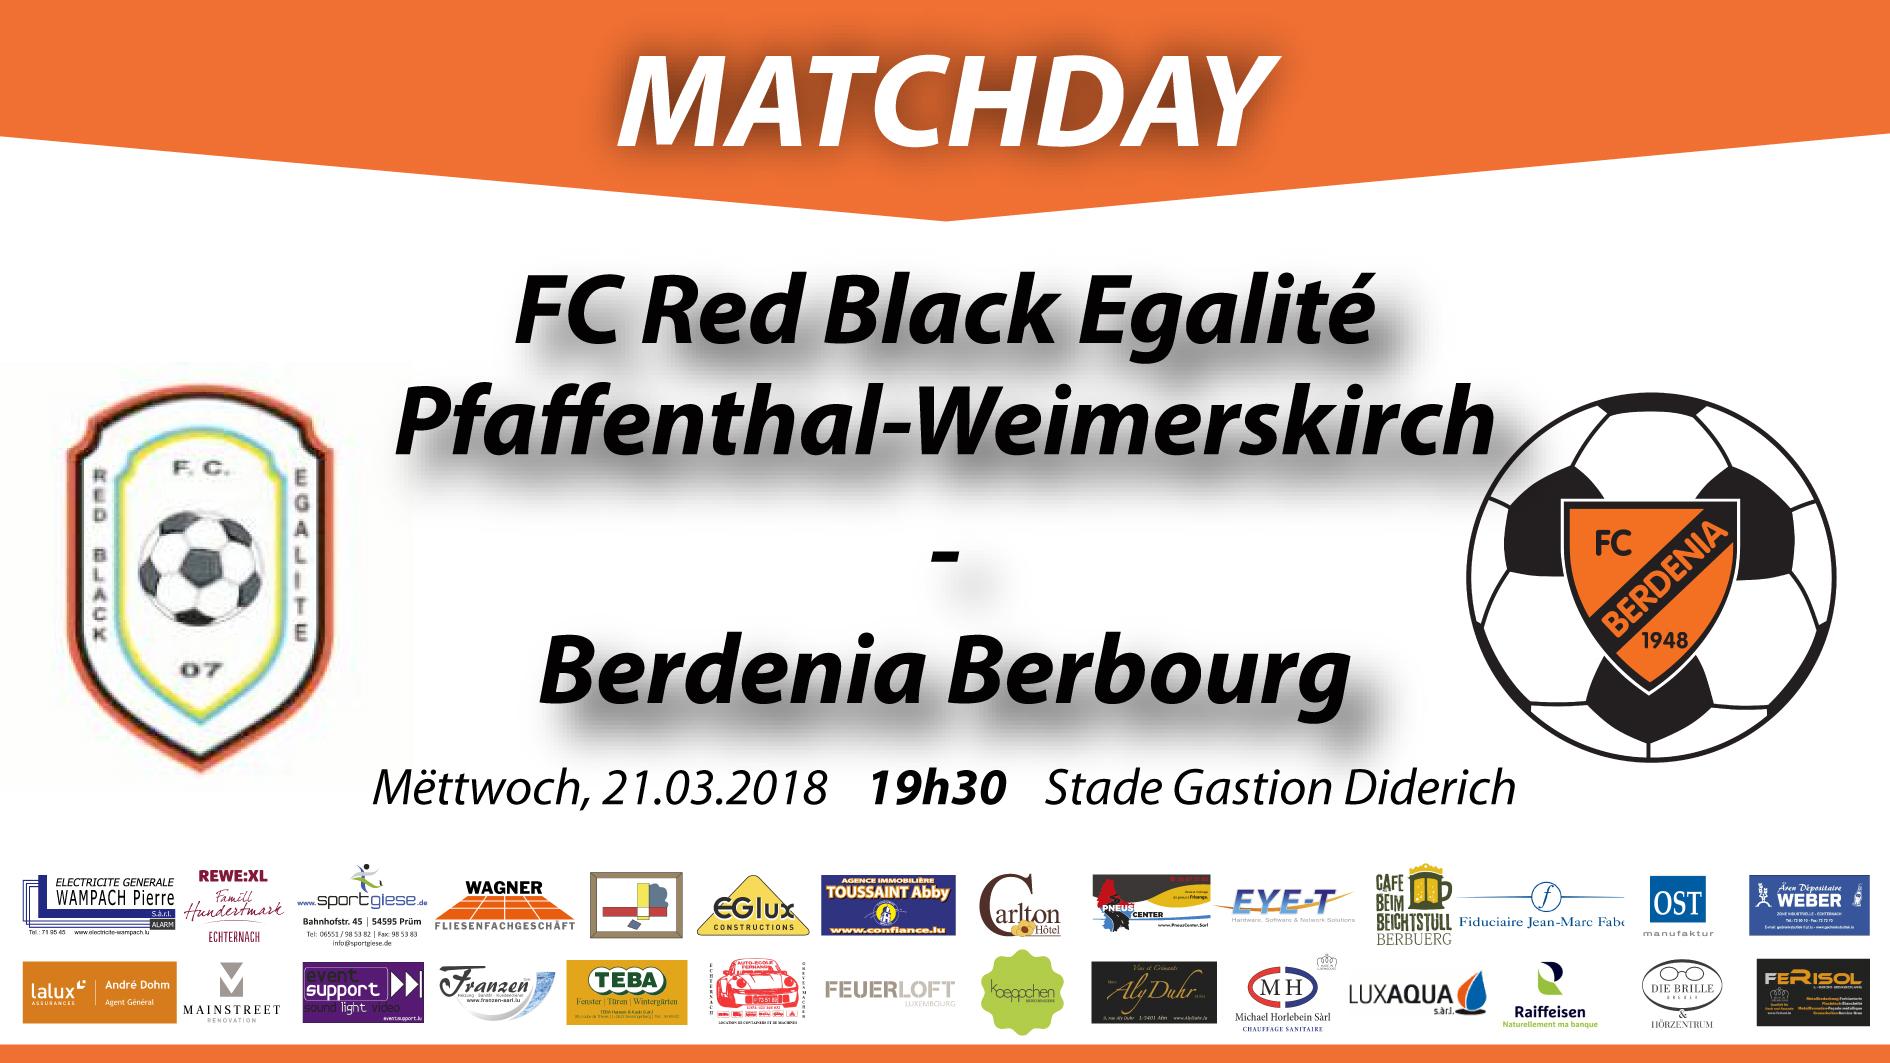 MATCHDAY: FC Red Black Egalité Pfaffenthal-Weimerskirch - FC Berdenia Berbourg